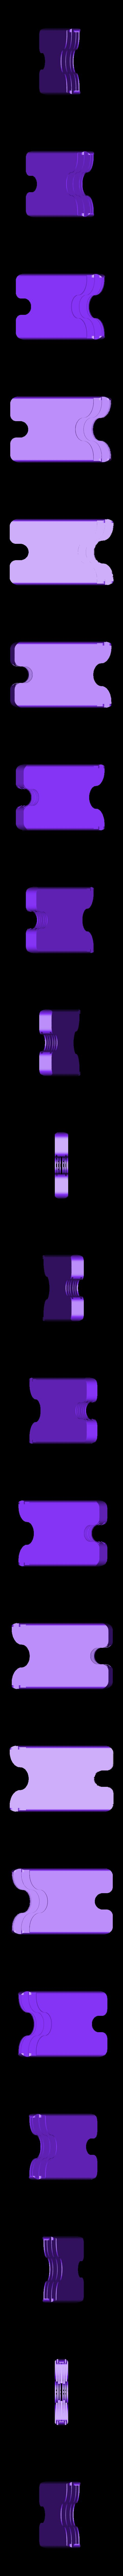 Tiny_wallet_v12.stl Download free STL file Tiny Wallet • Design to 3D print, FrankLumien